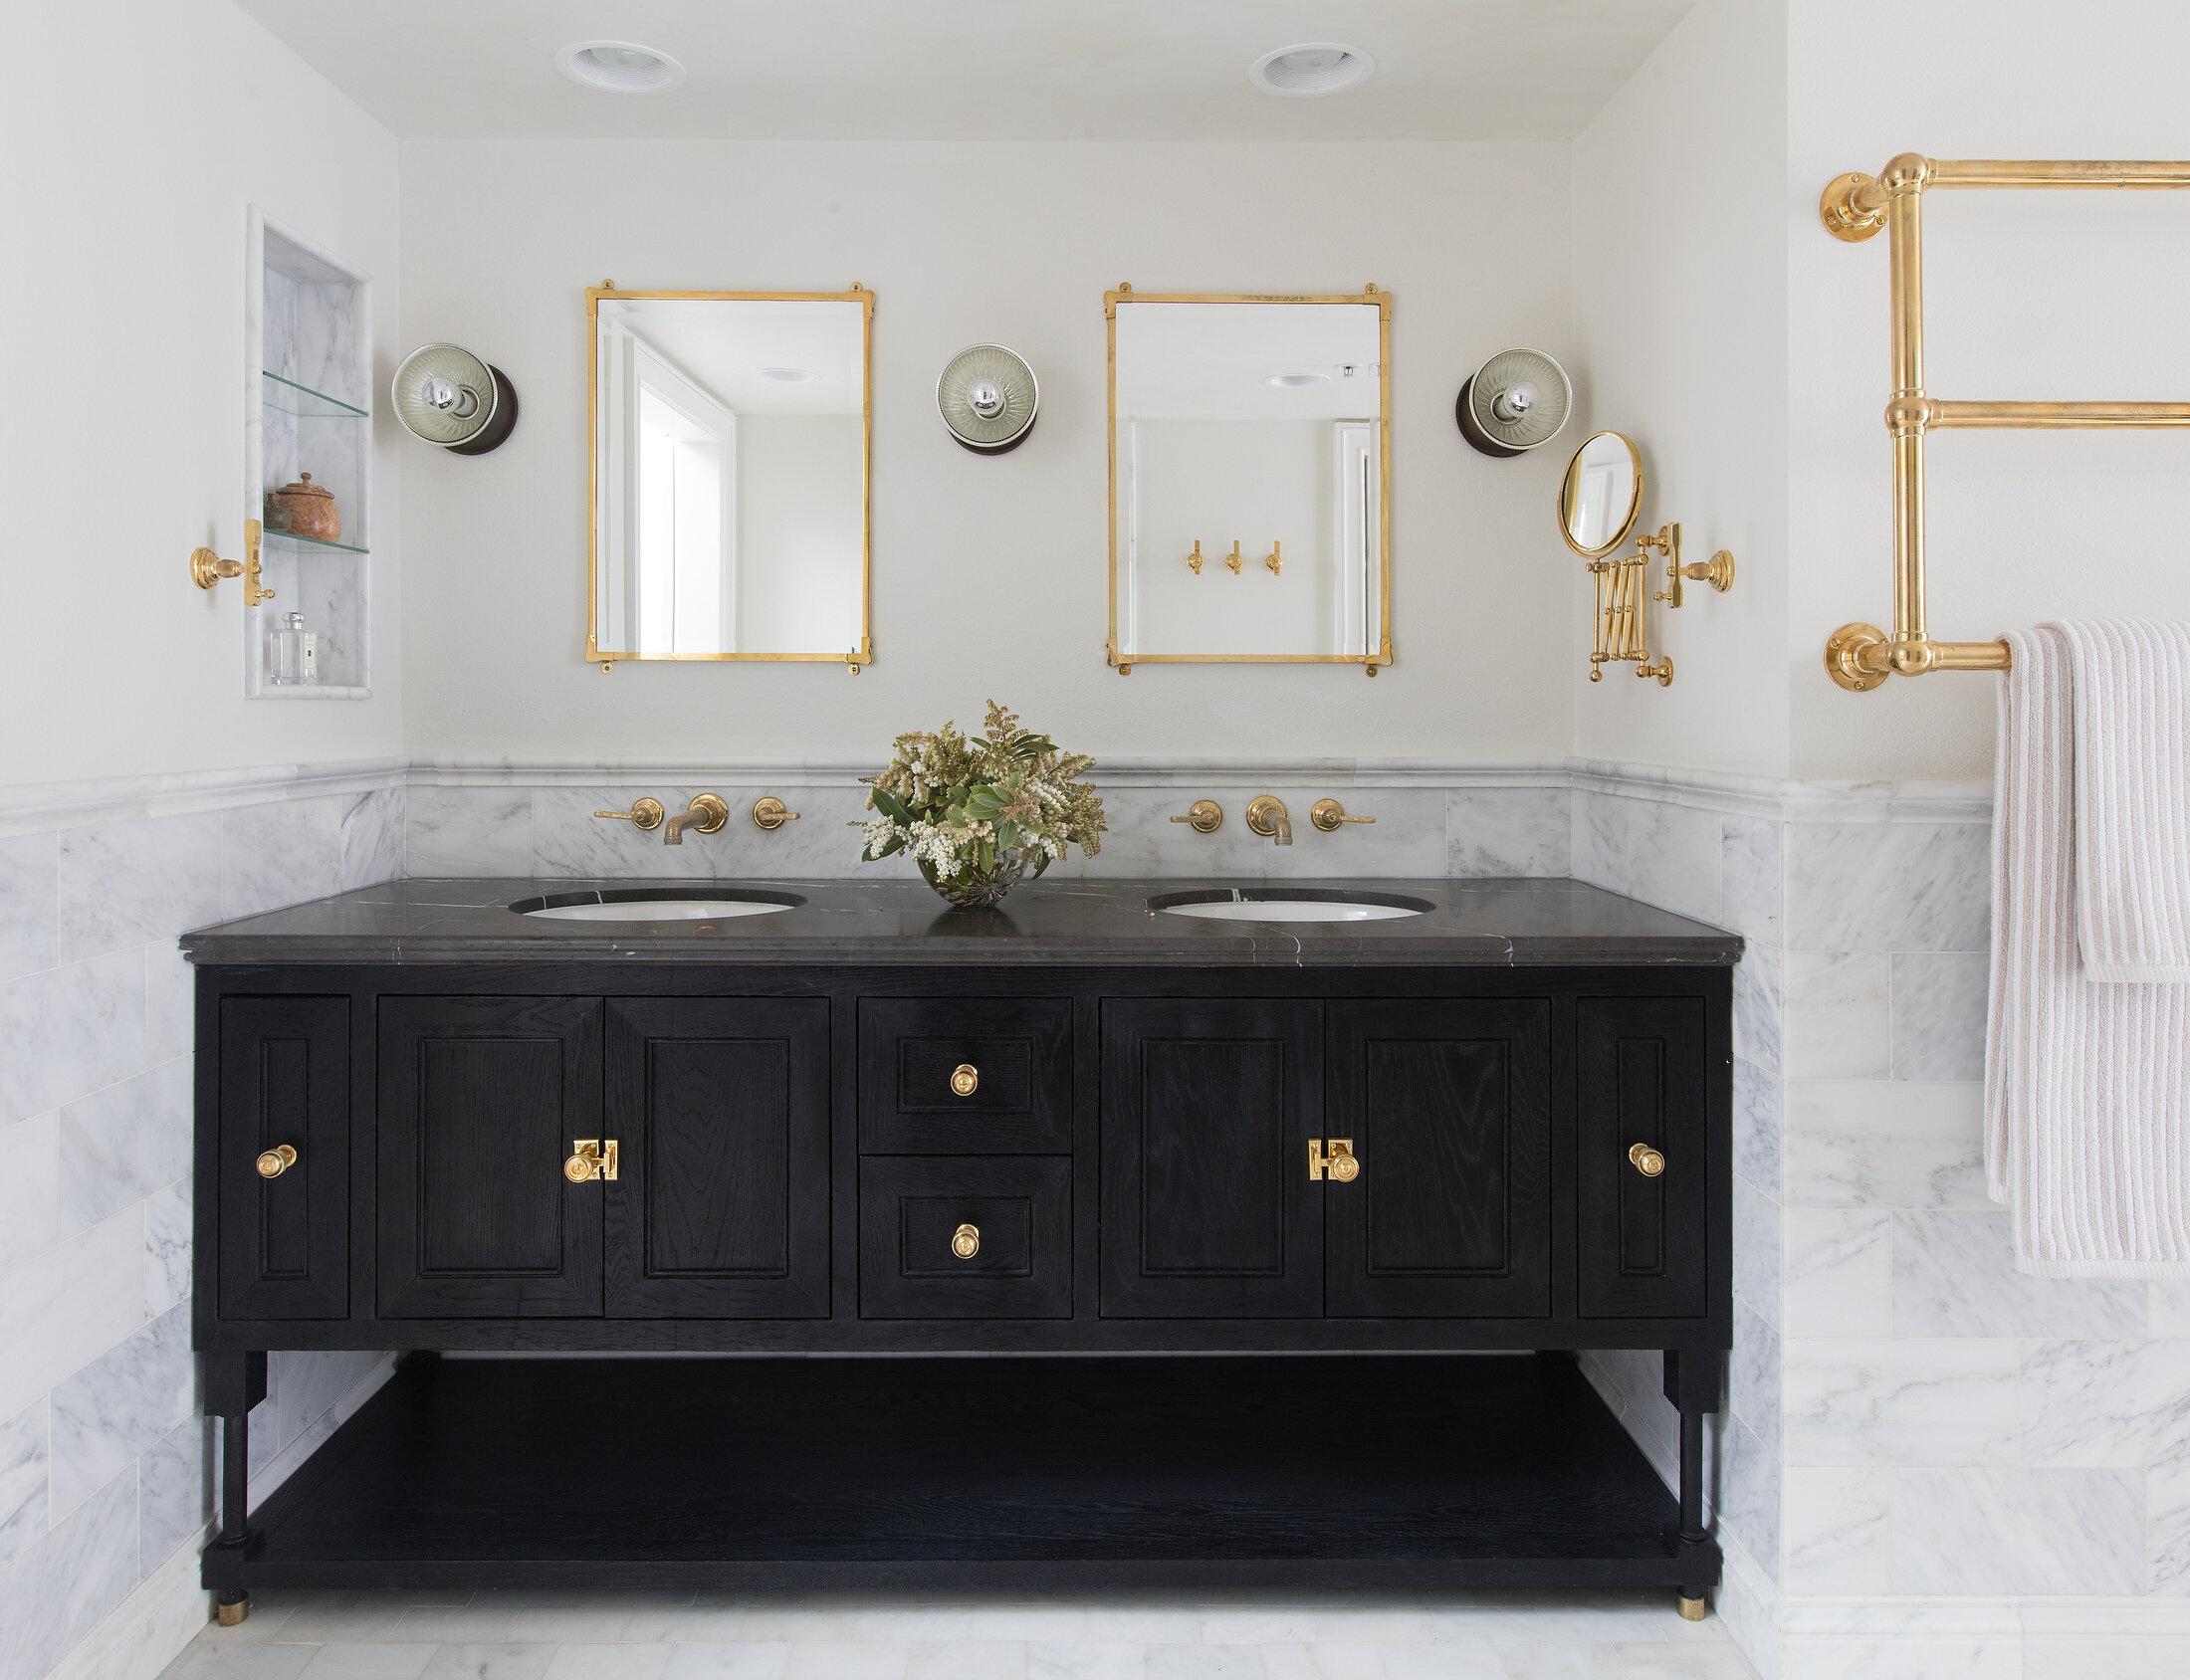 stefani stein interior design custom bath with waterworks and urban electric with blackened oak photo by stephen busken